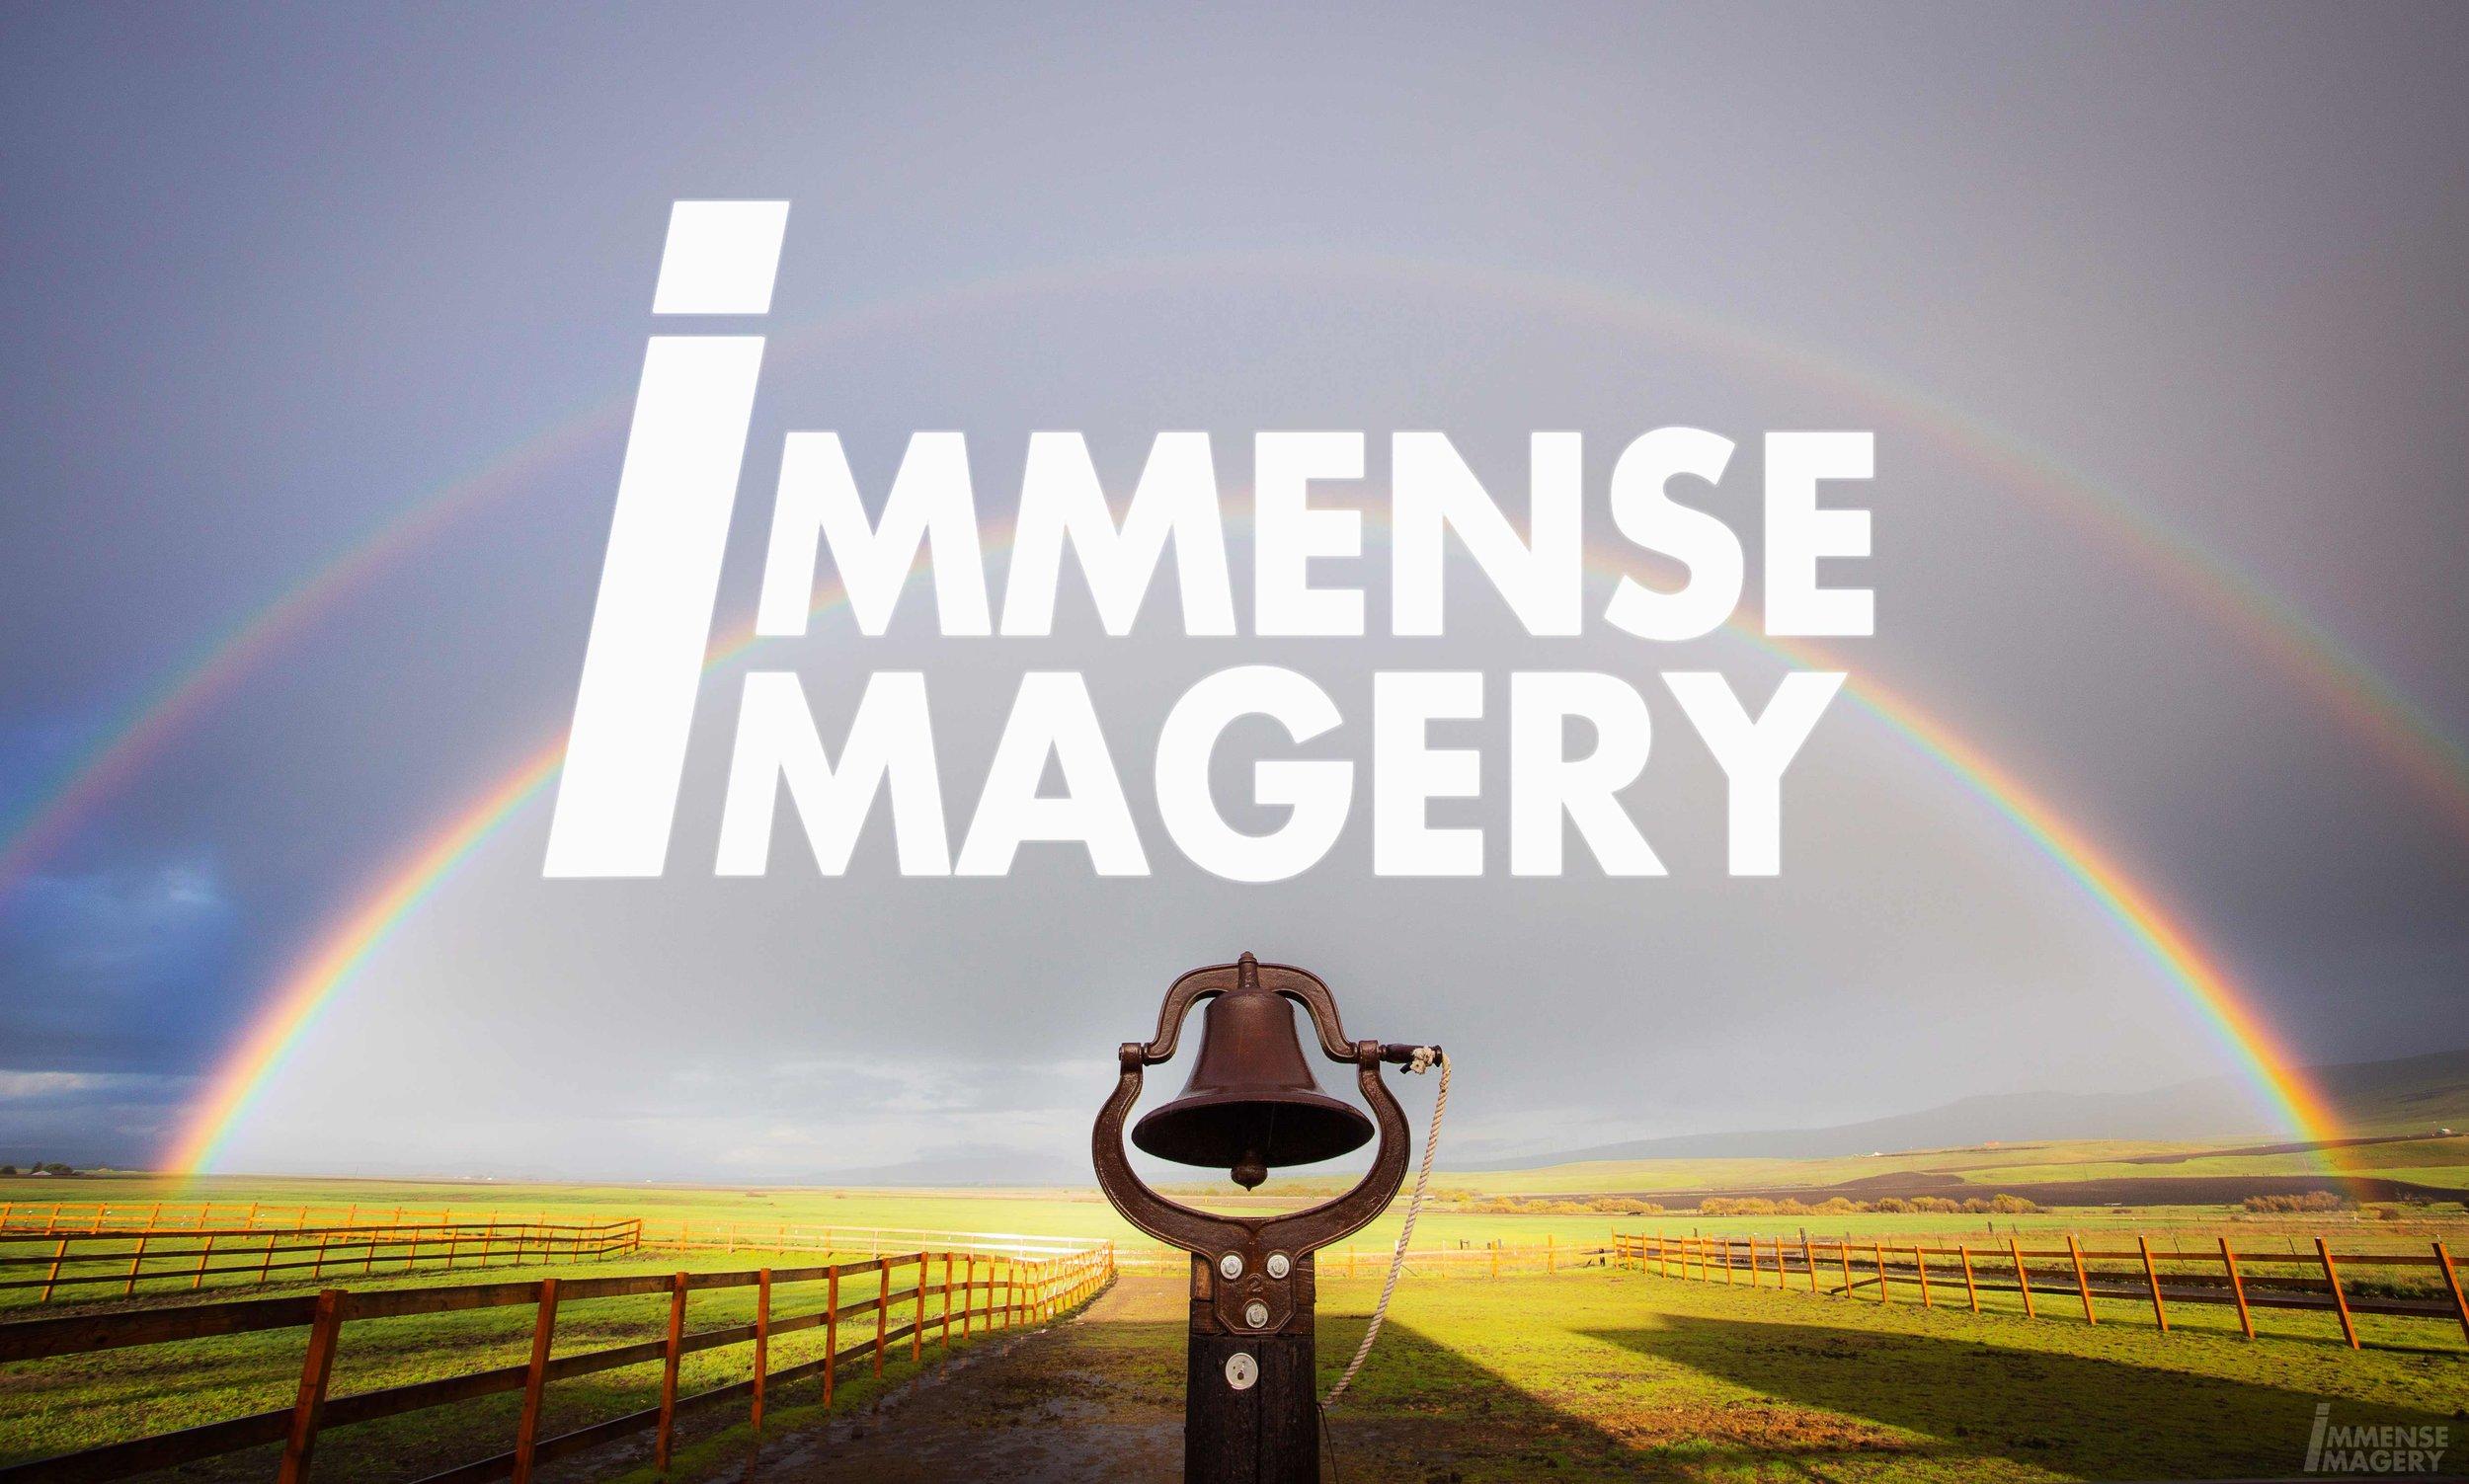 Immense-Imagery-Double-Rainbow (2).jpg